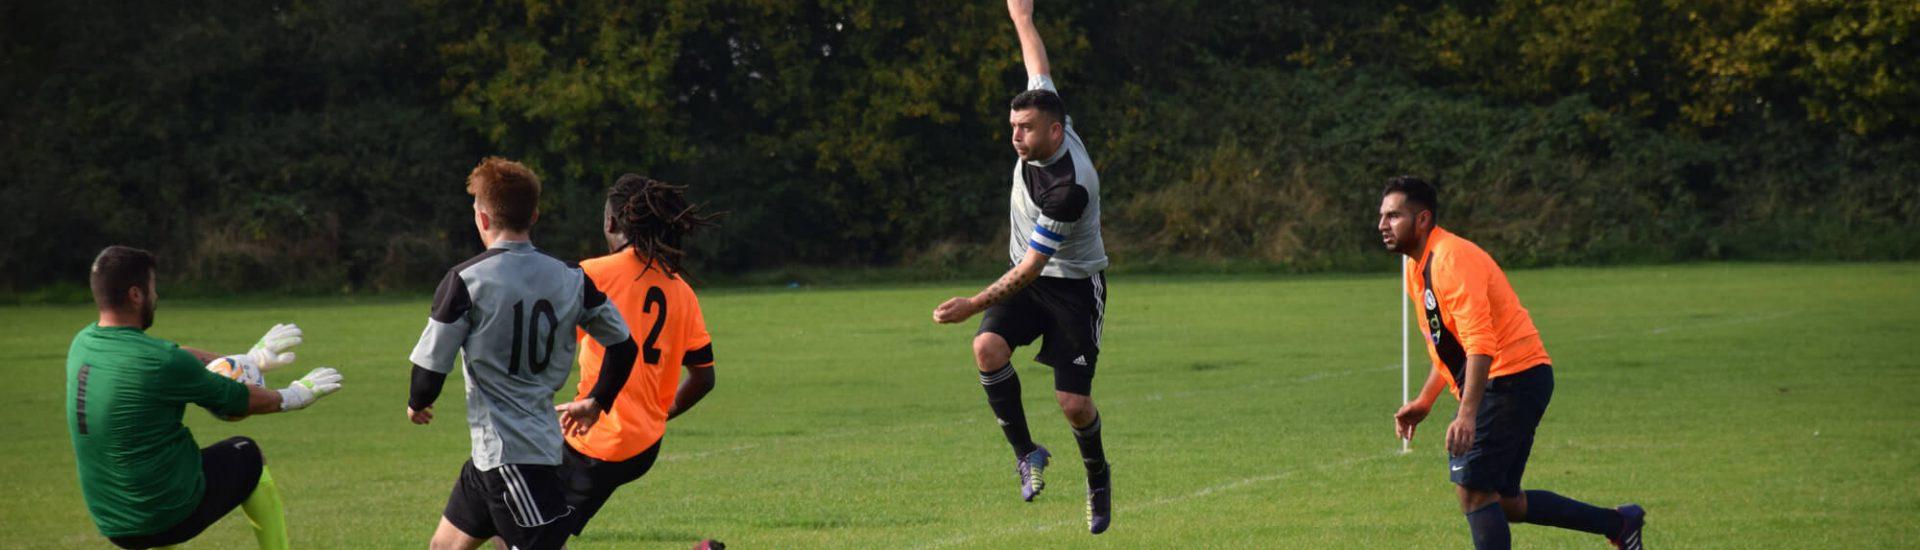 Can technology improve an amateur football team